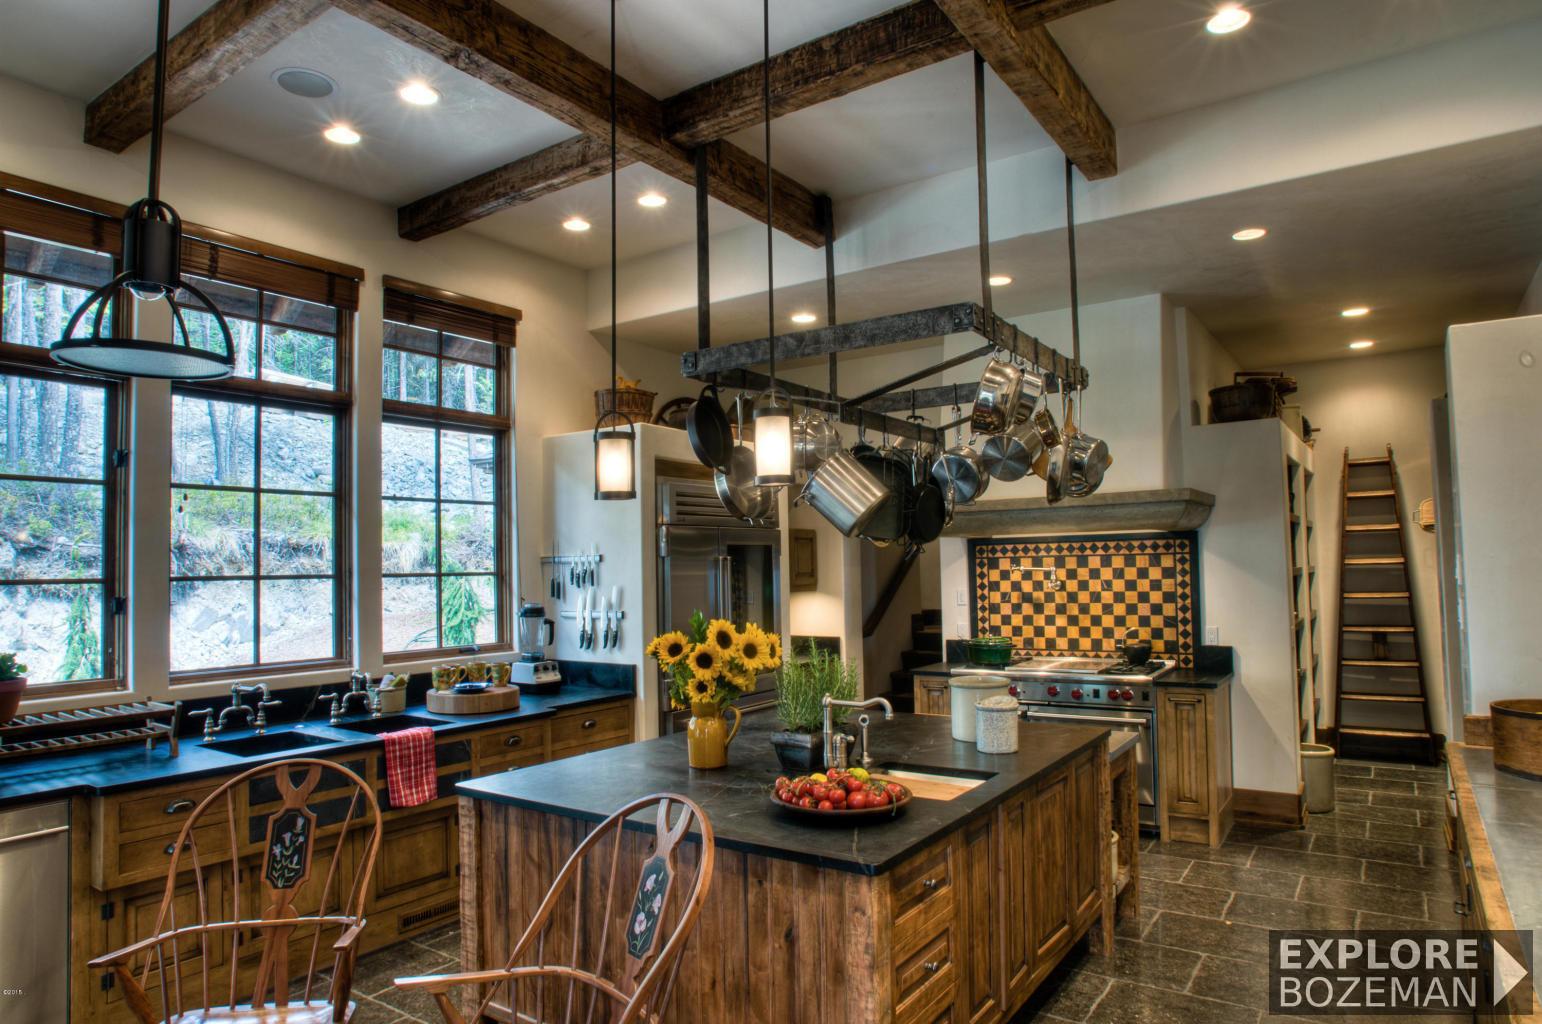 Montana Kitchens